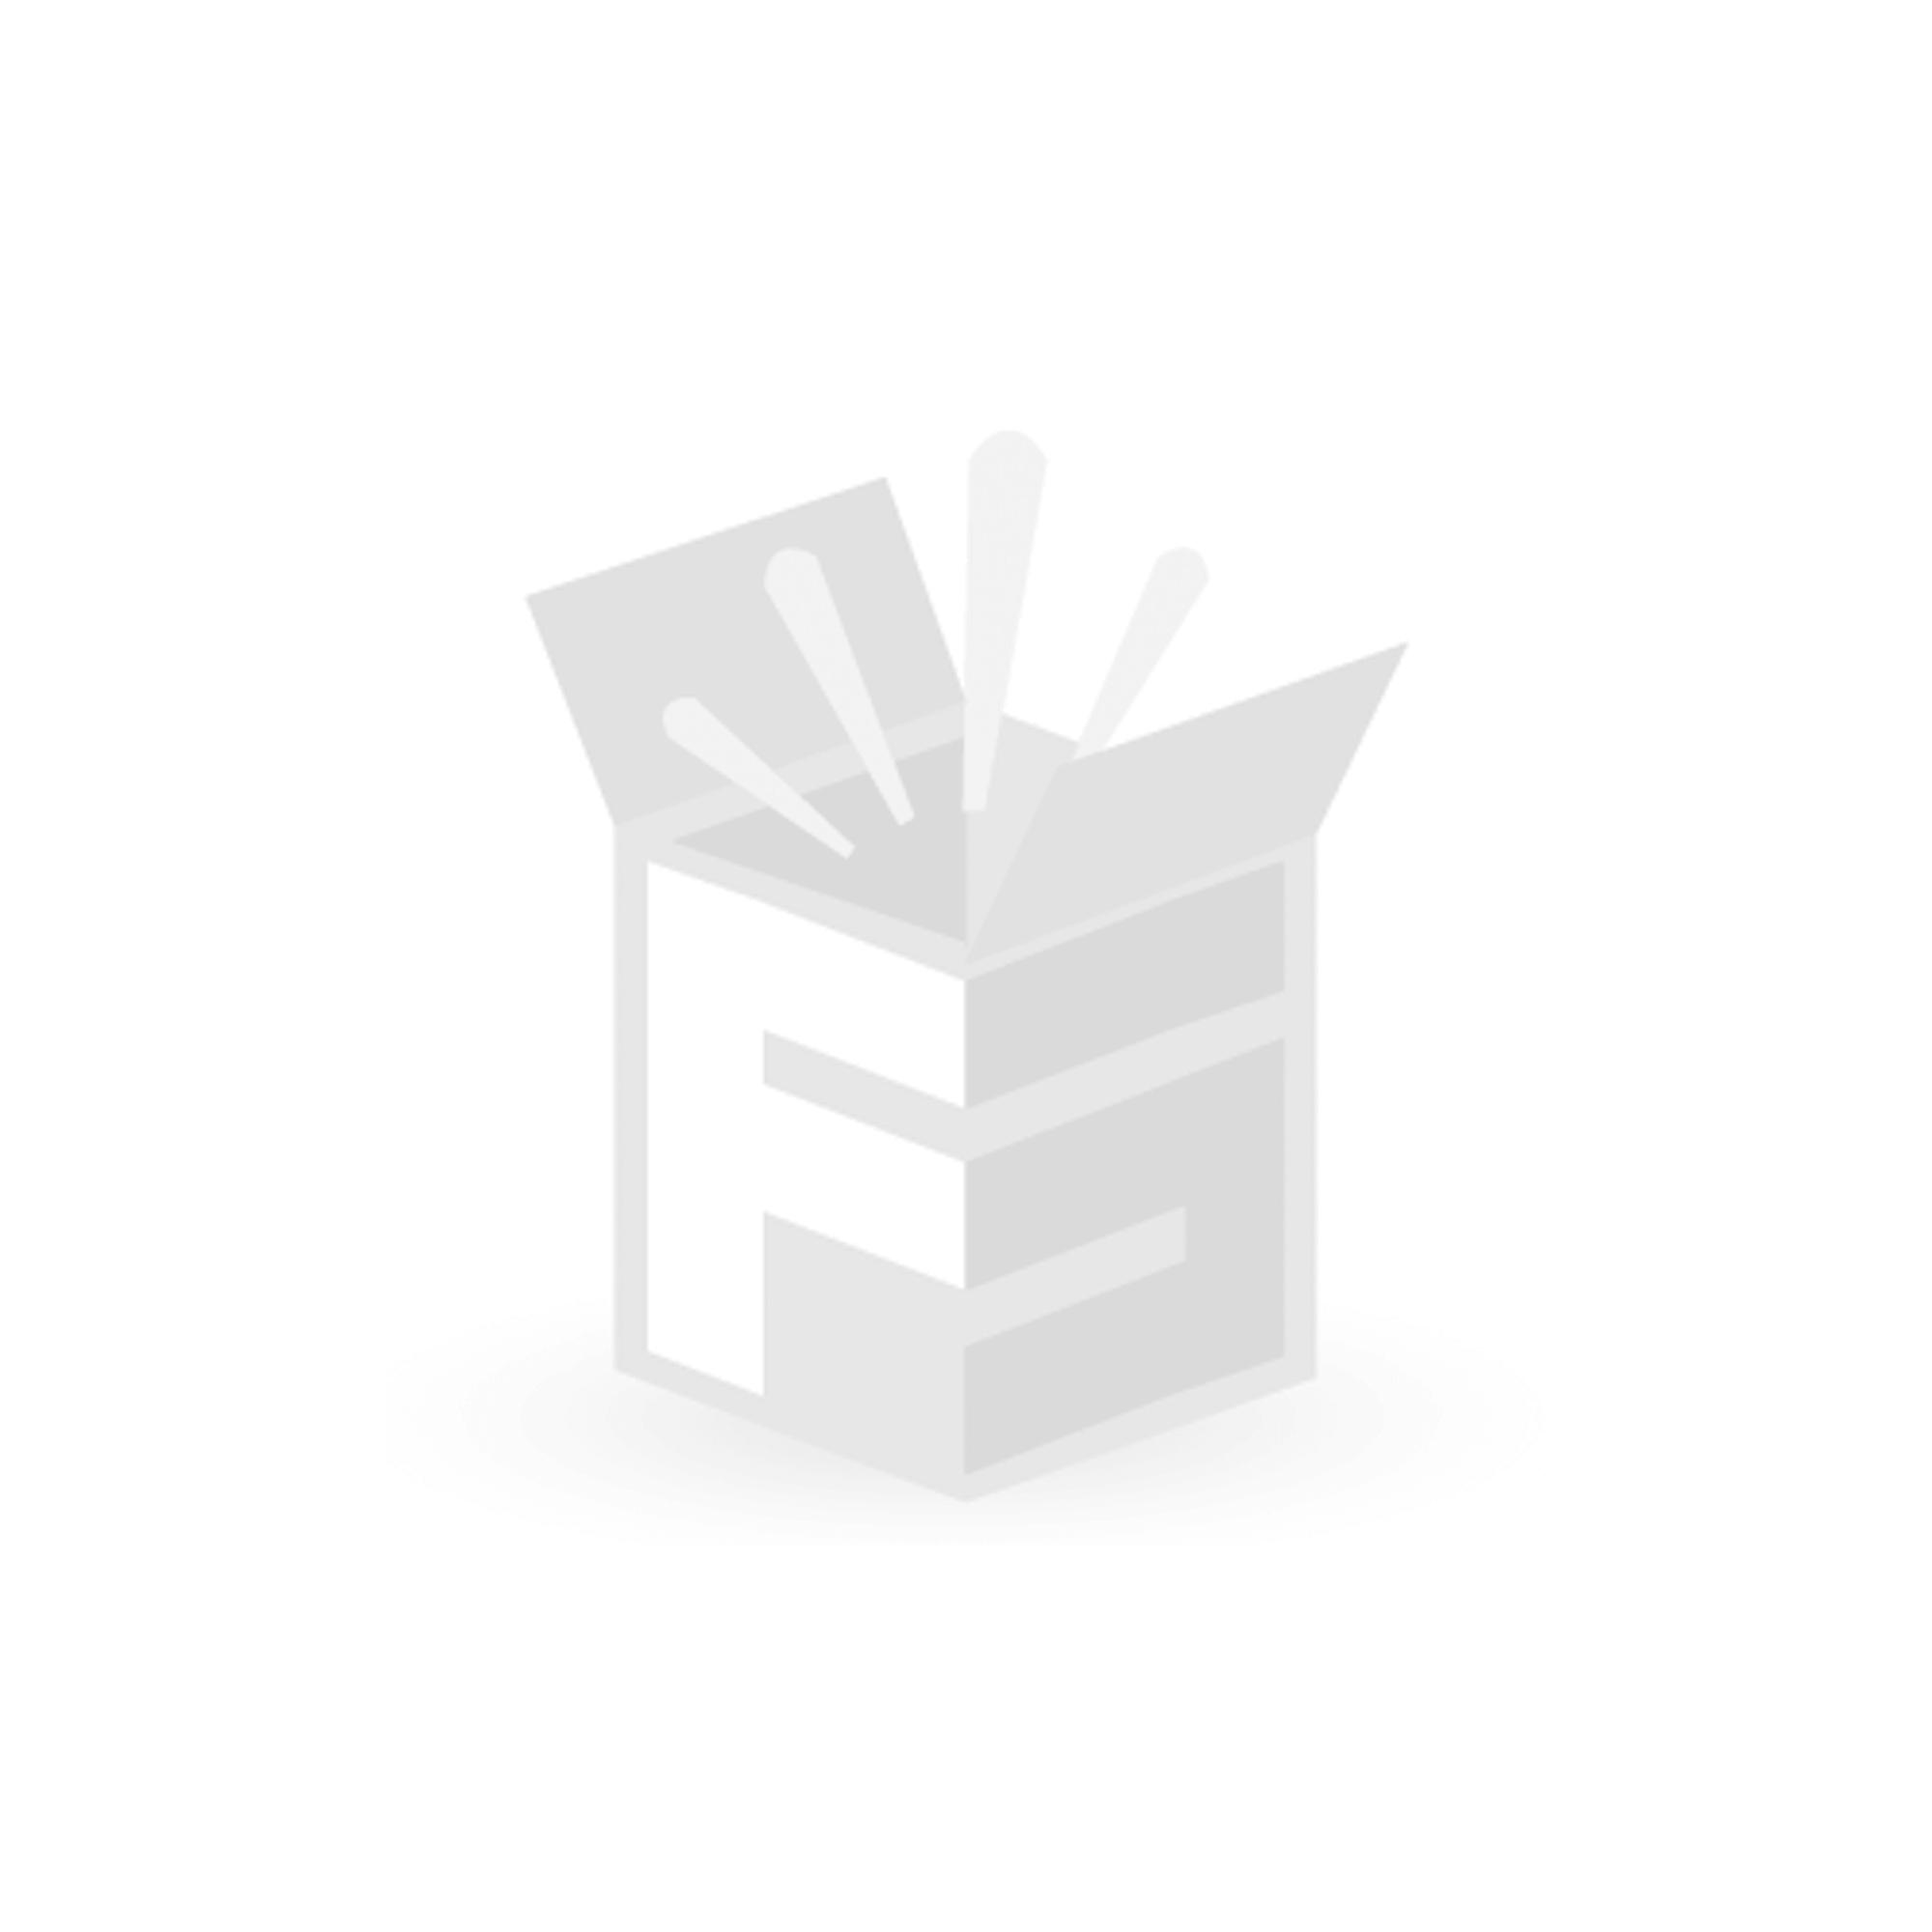 Heizdraht zu Vakuum-Verpackungsmaschine 350